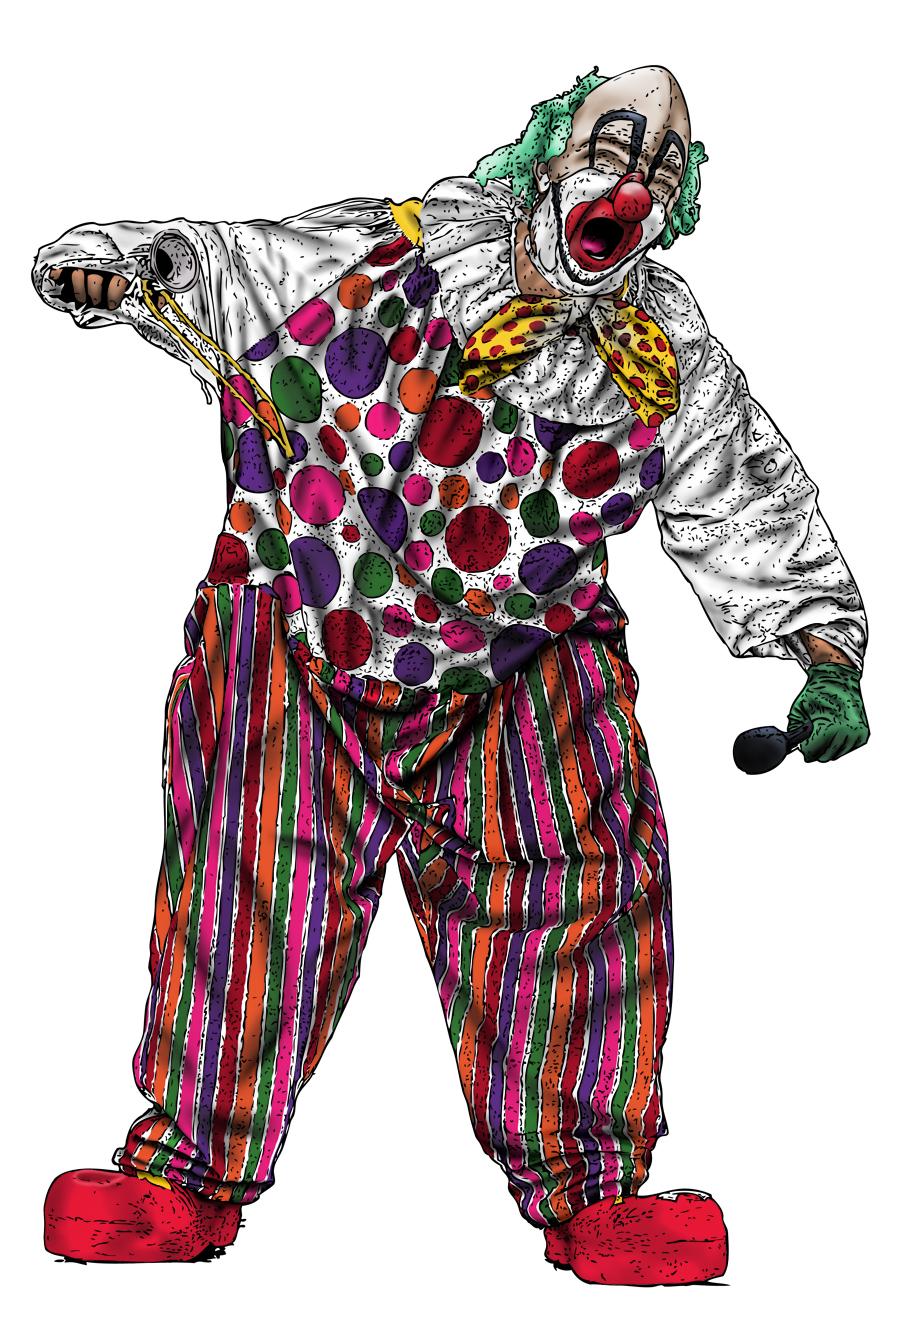 001 Reboot Yucko_the_Clown_by_kangate